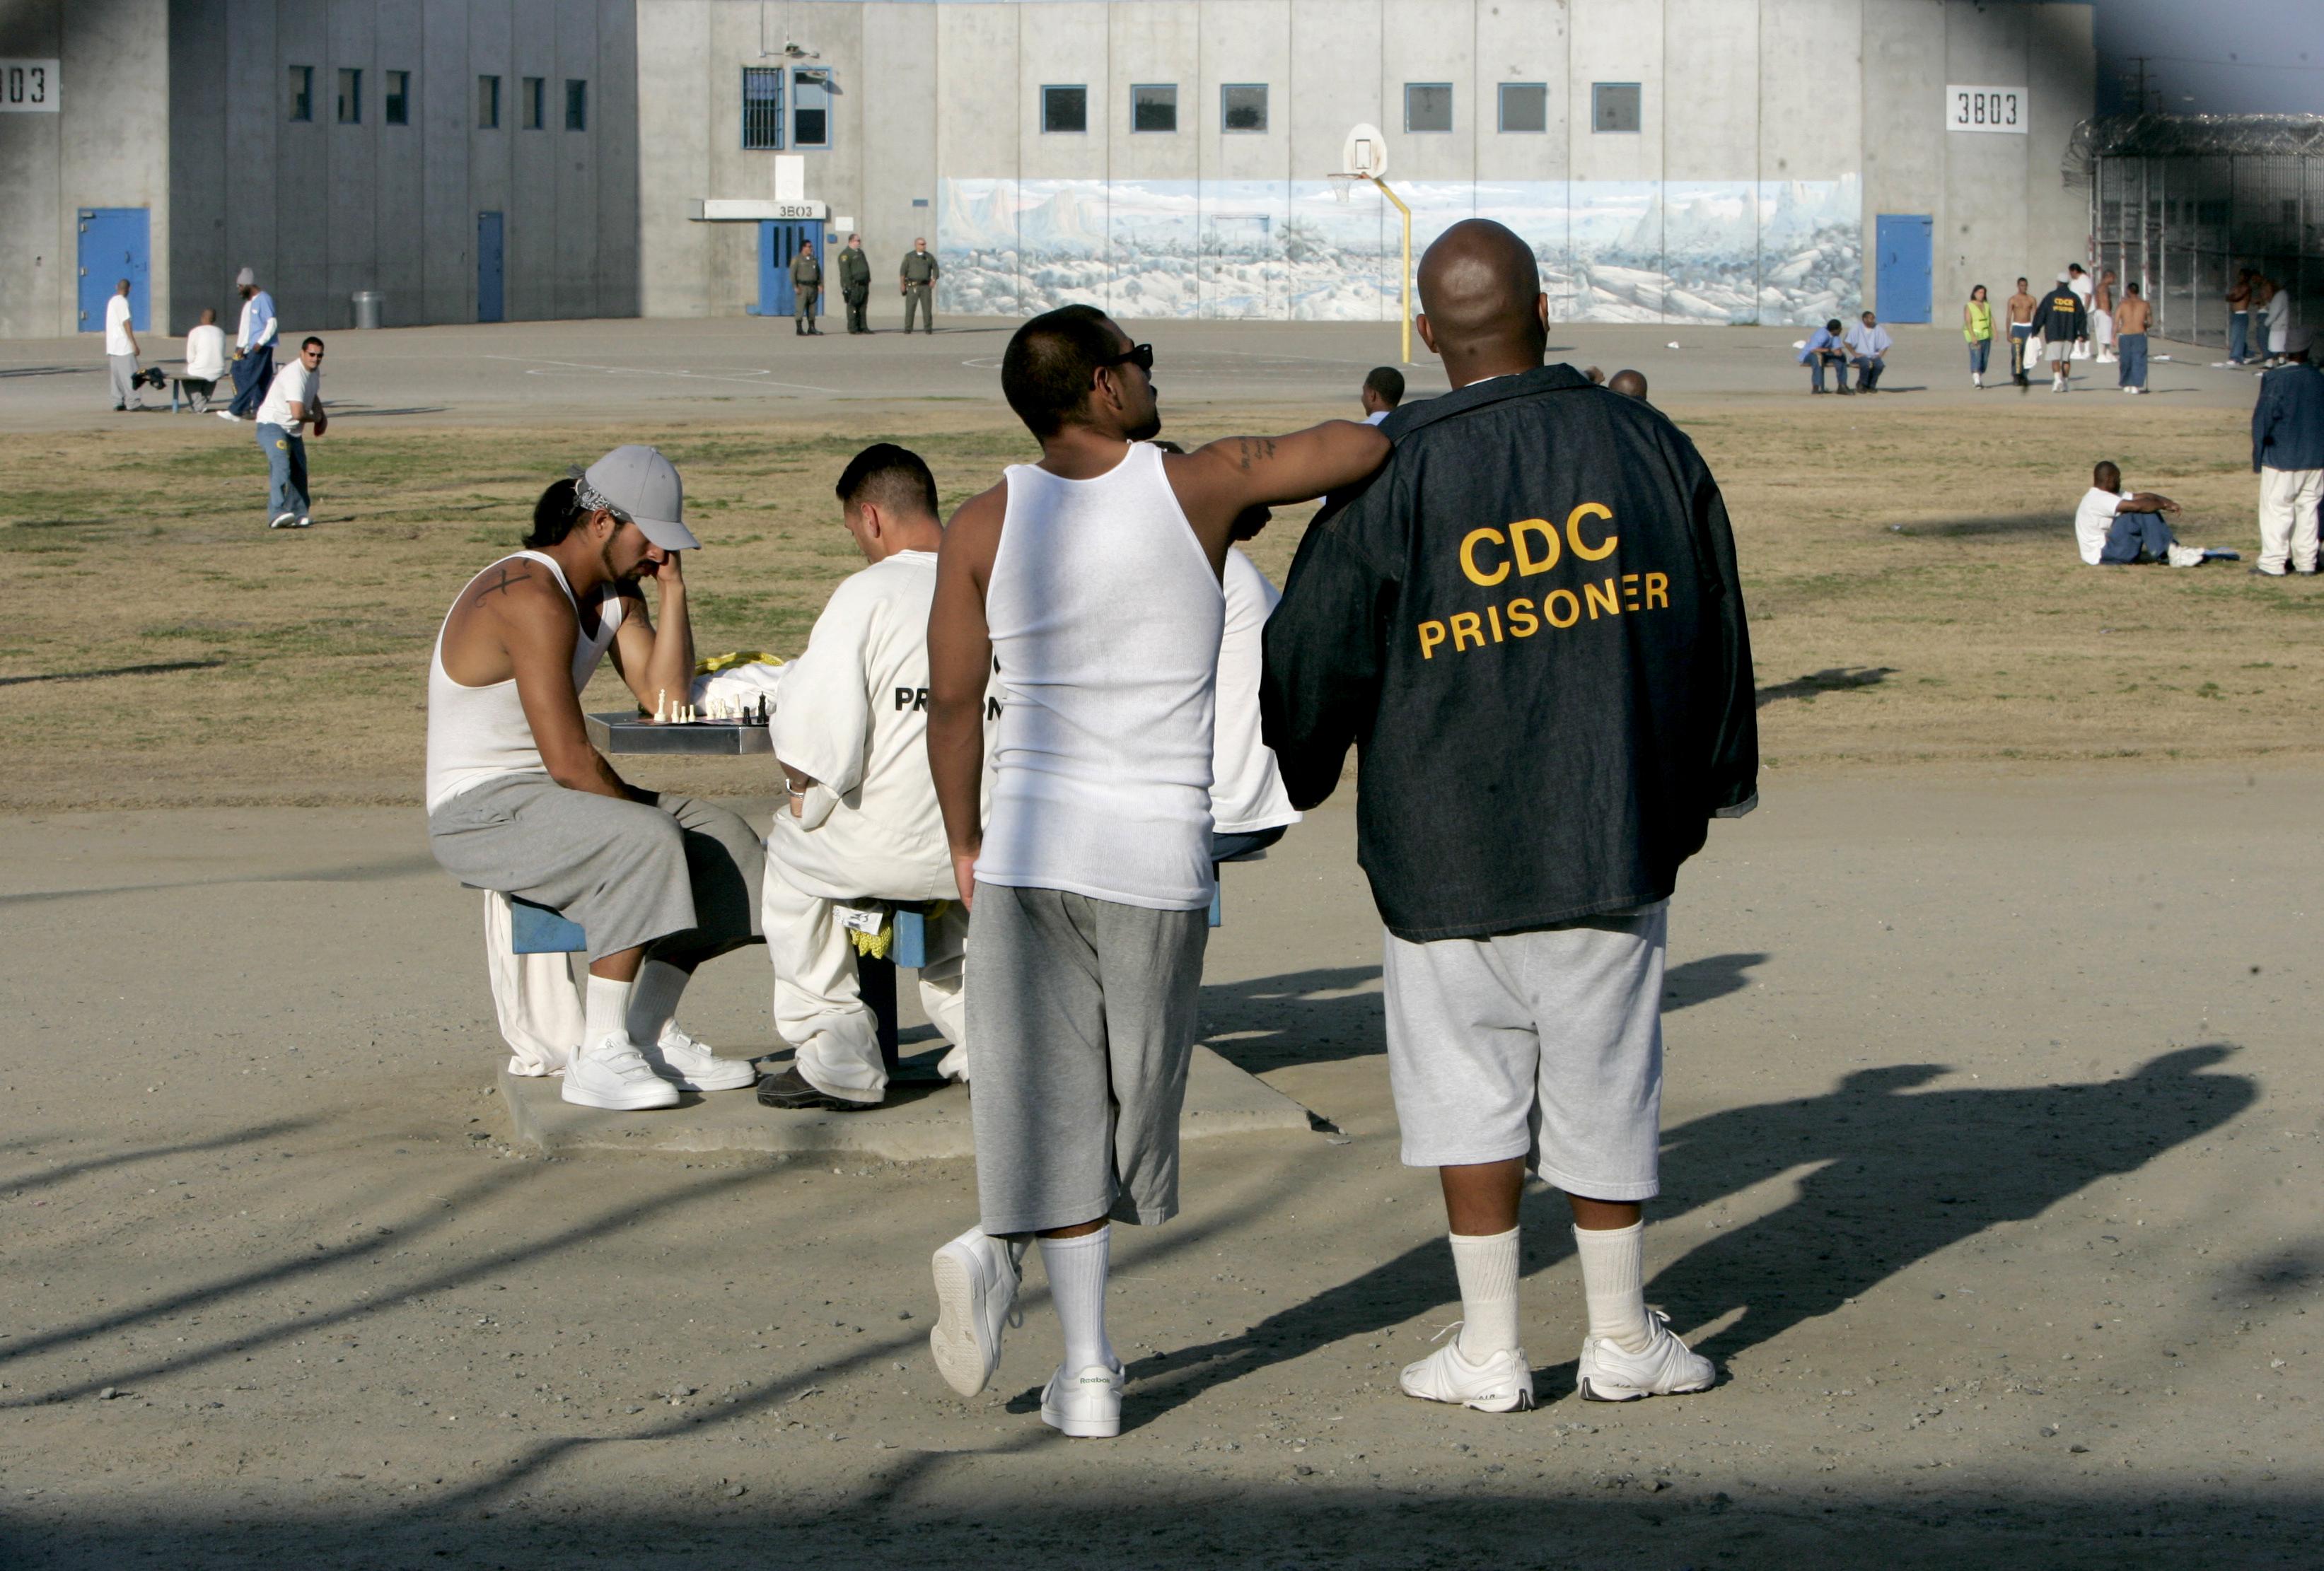 APNewsBreak: California halts prison gang peacemaking effort